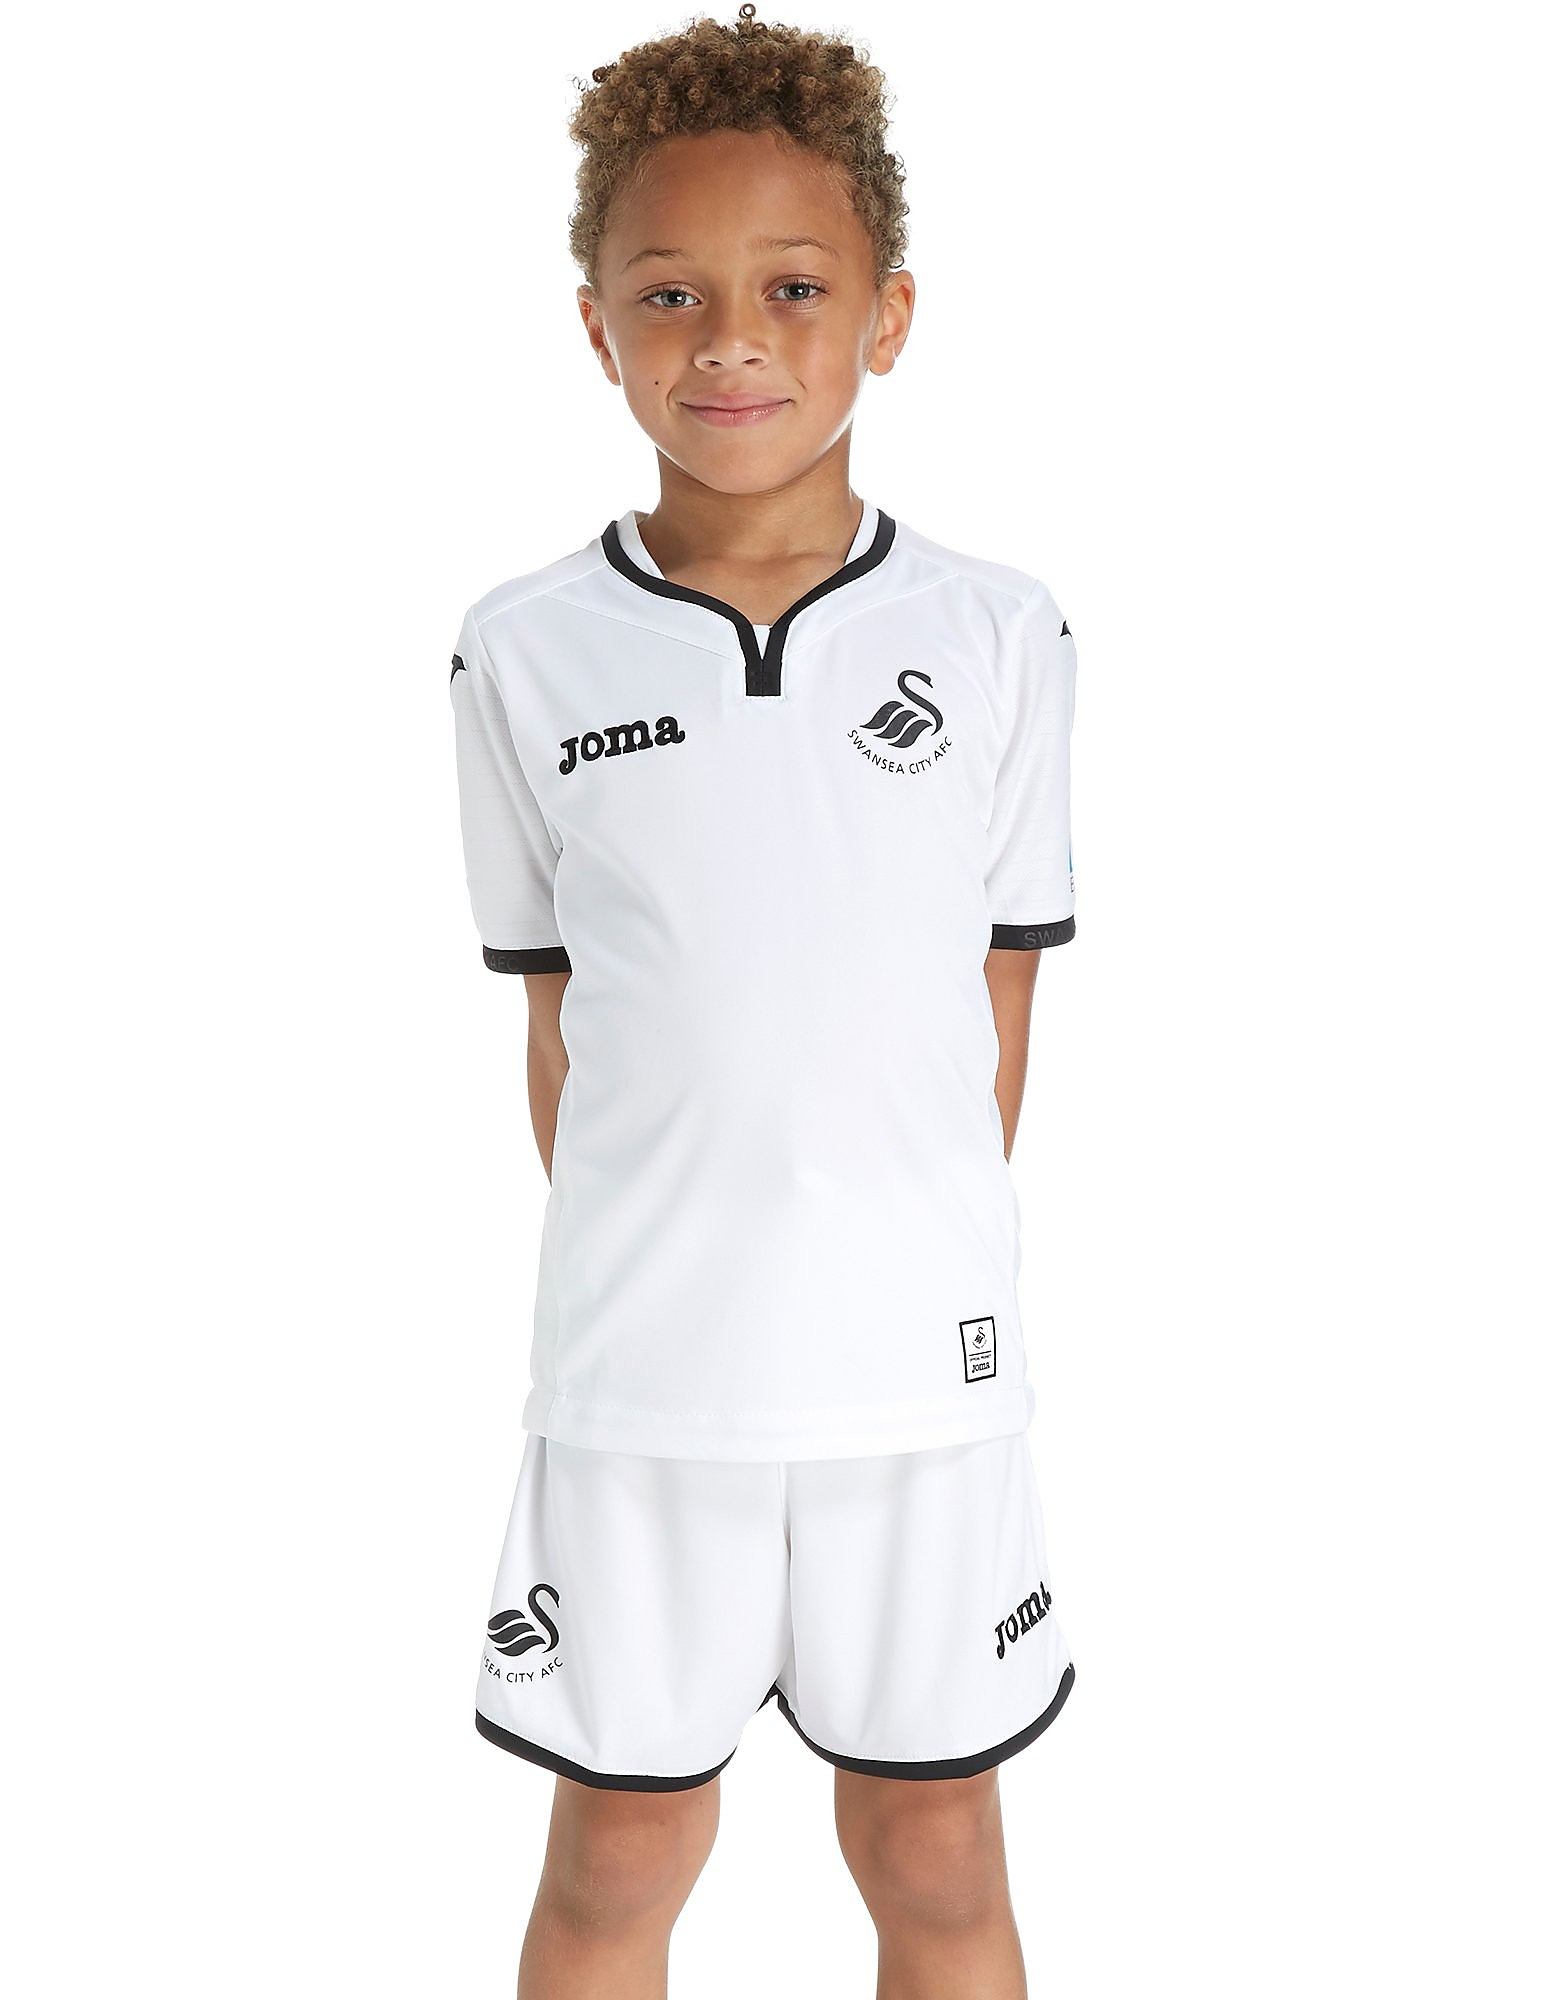 Joma Swansea City FC 2017/18 Home Kit Childrens